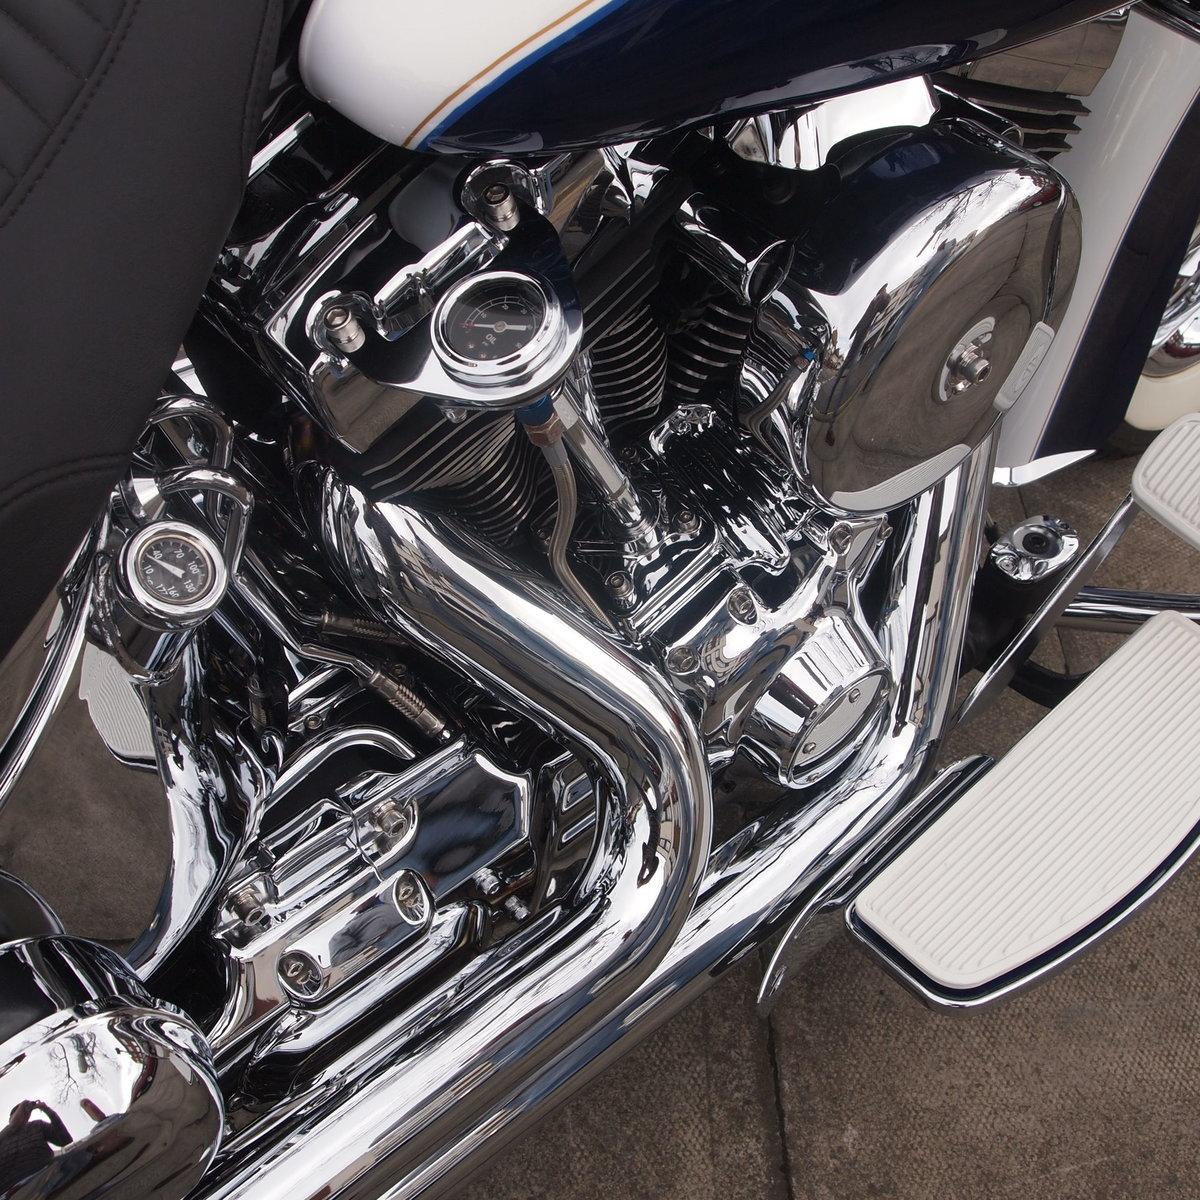 2008 Harley Davidson FLSTN Deluxe, RESERVED FOR FLEMMING. SOLD (picture 2 of 6)